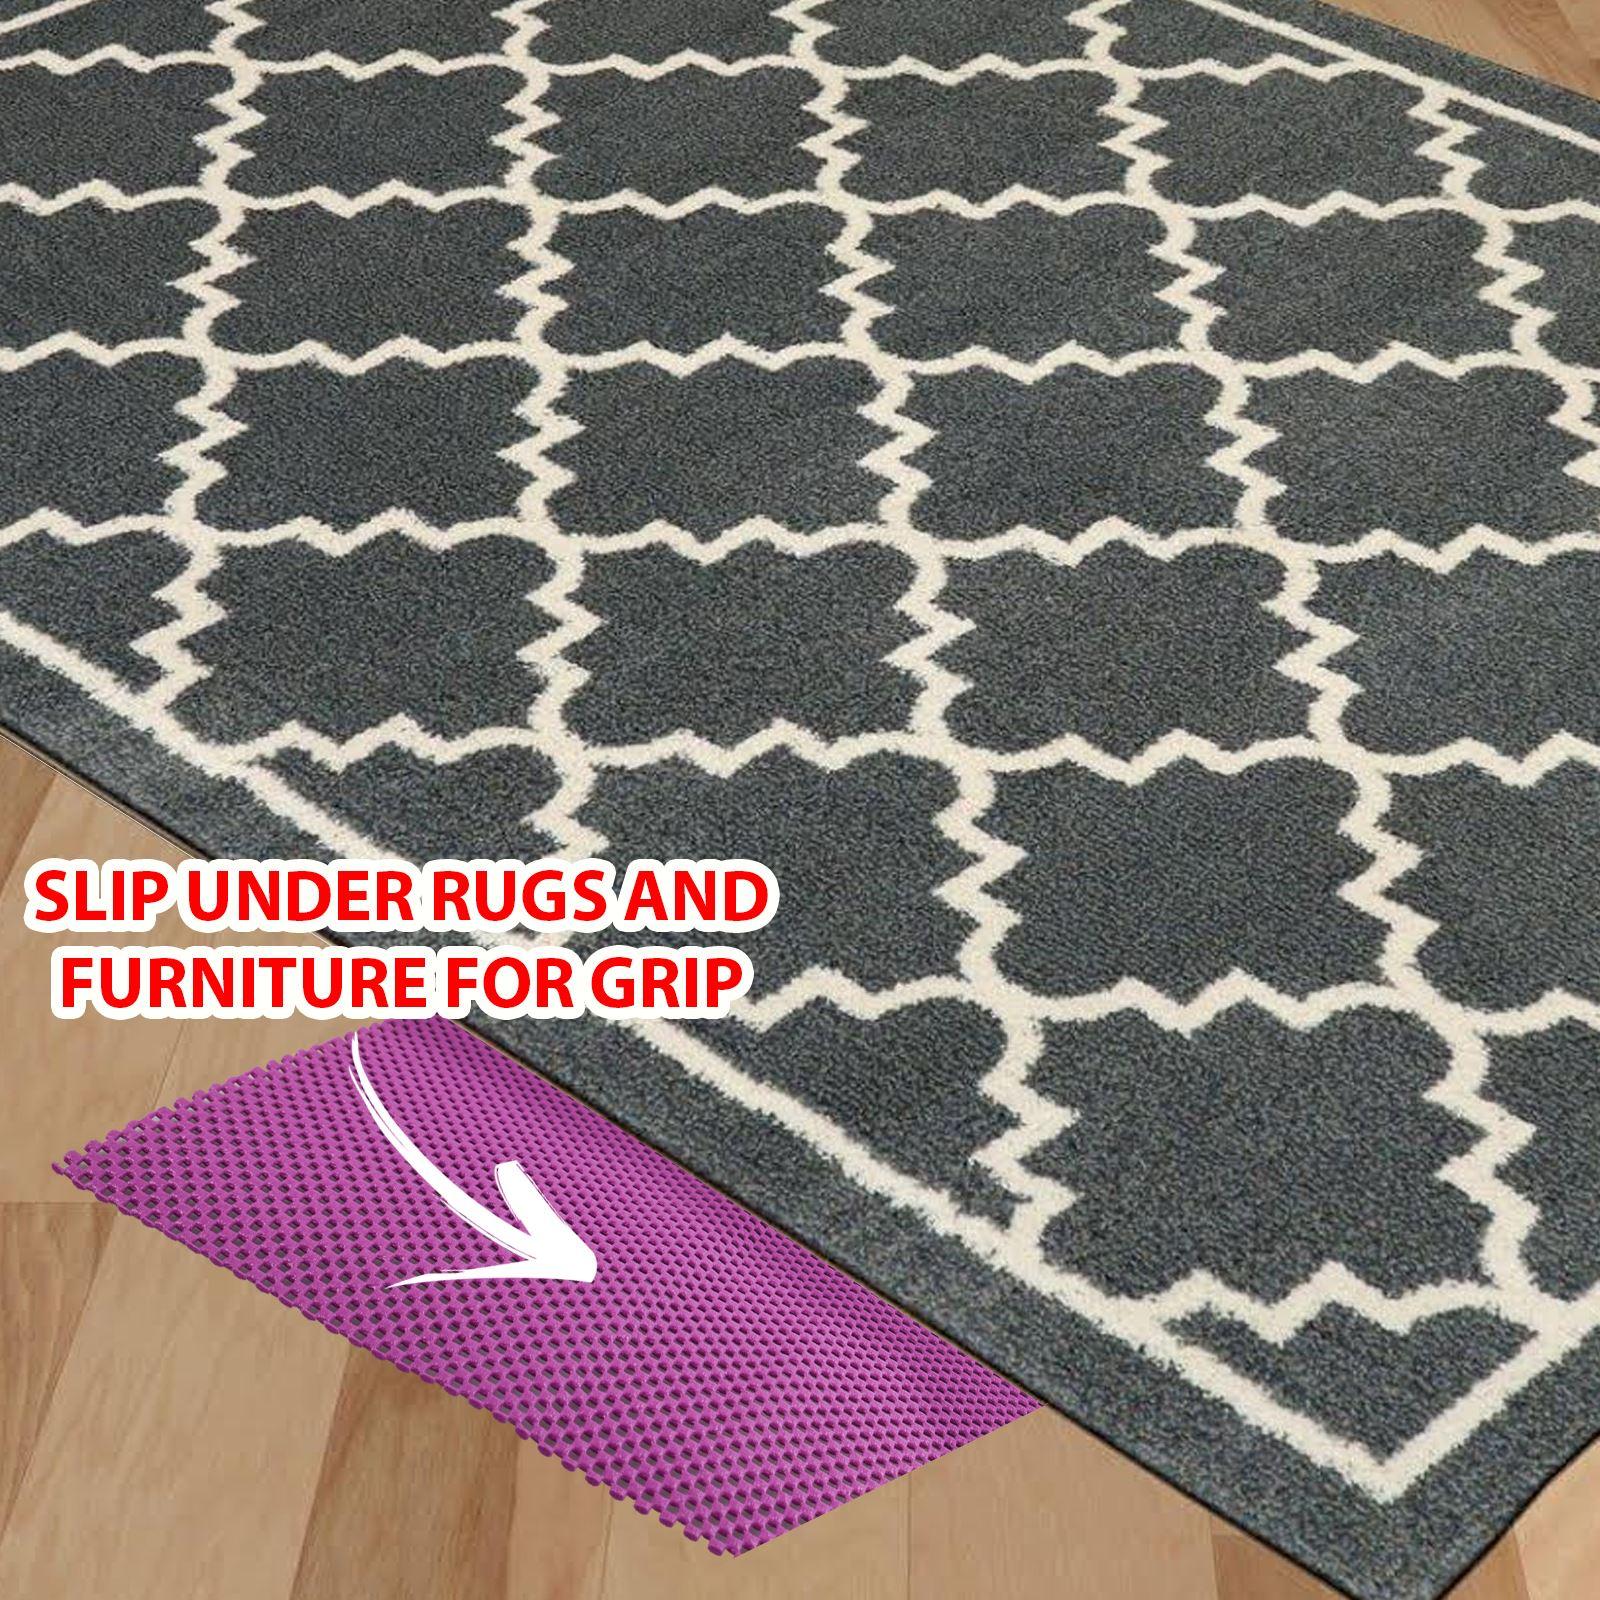 Multi-Purpose-Anti-Non-Slip-Rubber-Mat-Drawer-Liner-Flooring-Gripper-Carpet-Rug thumbnail 20